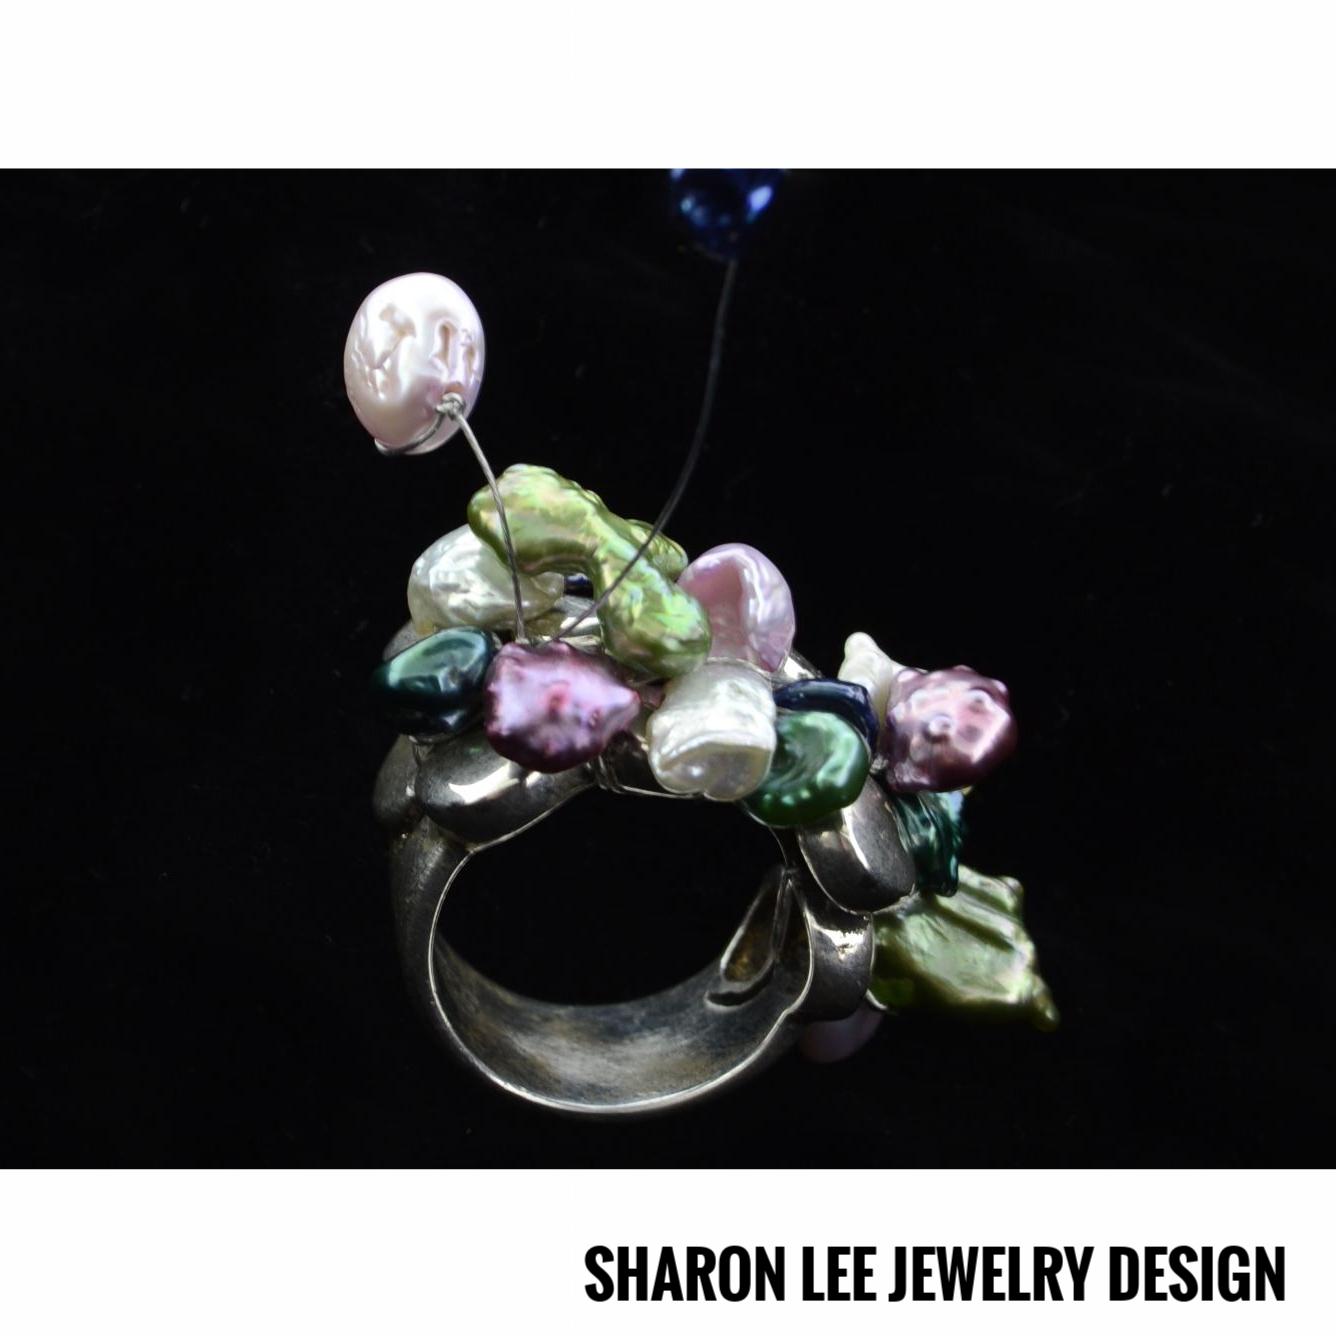 Sharon Lee Jewelry Design